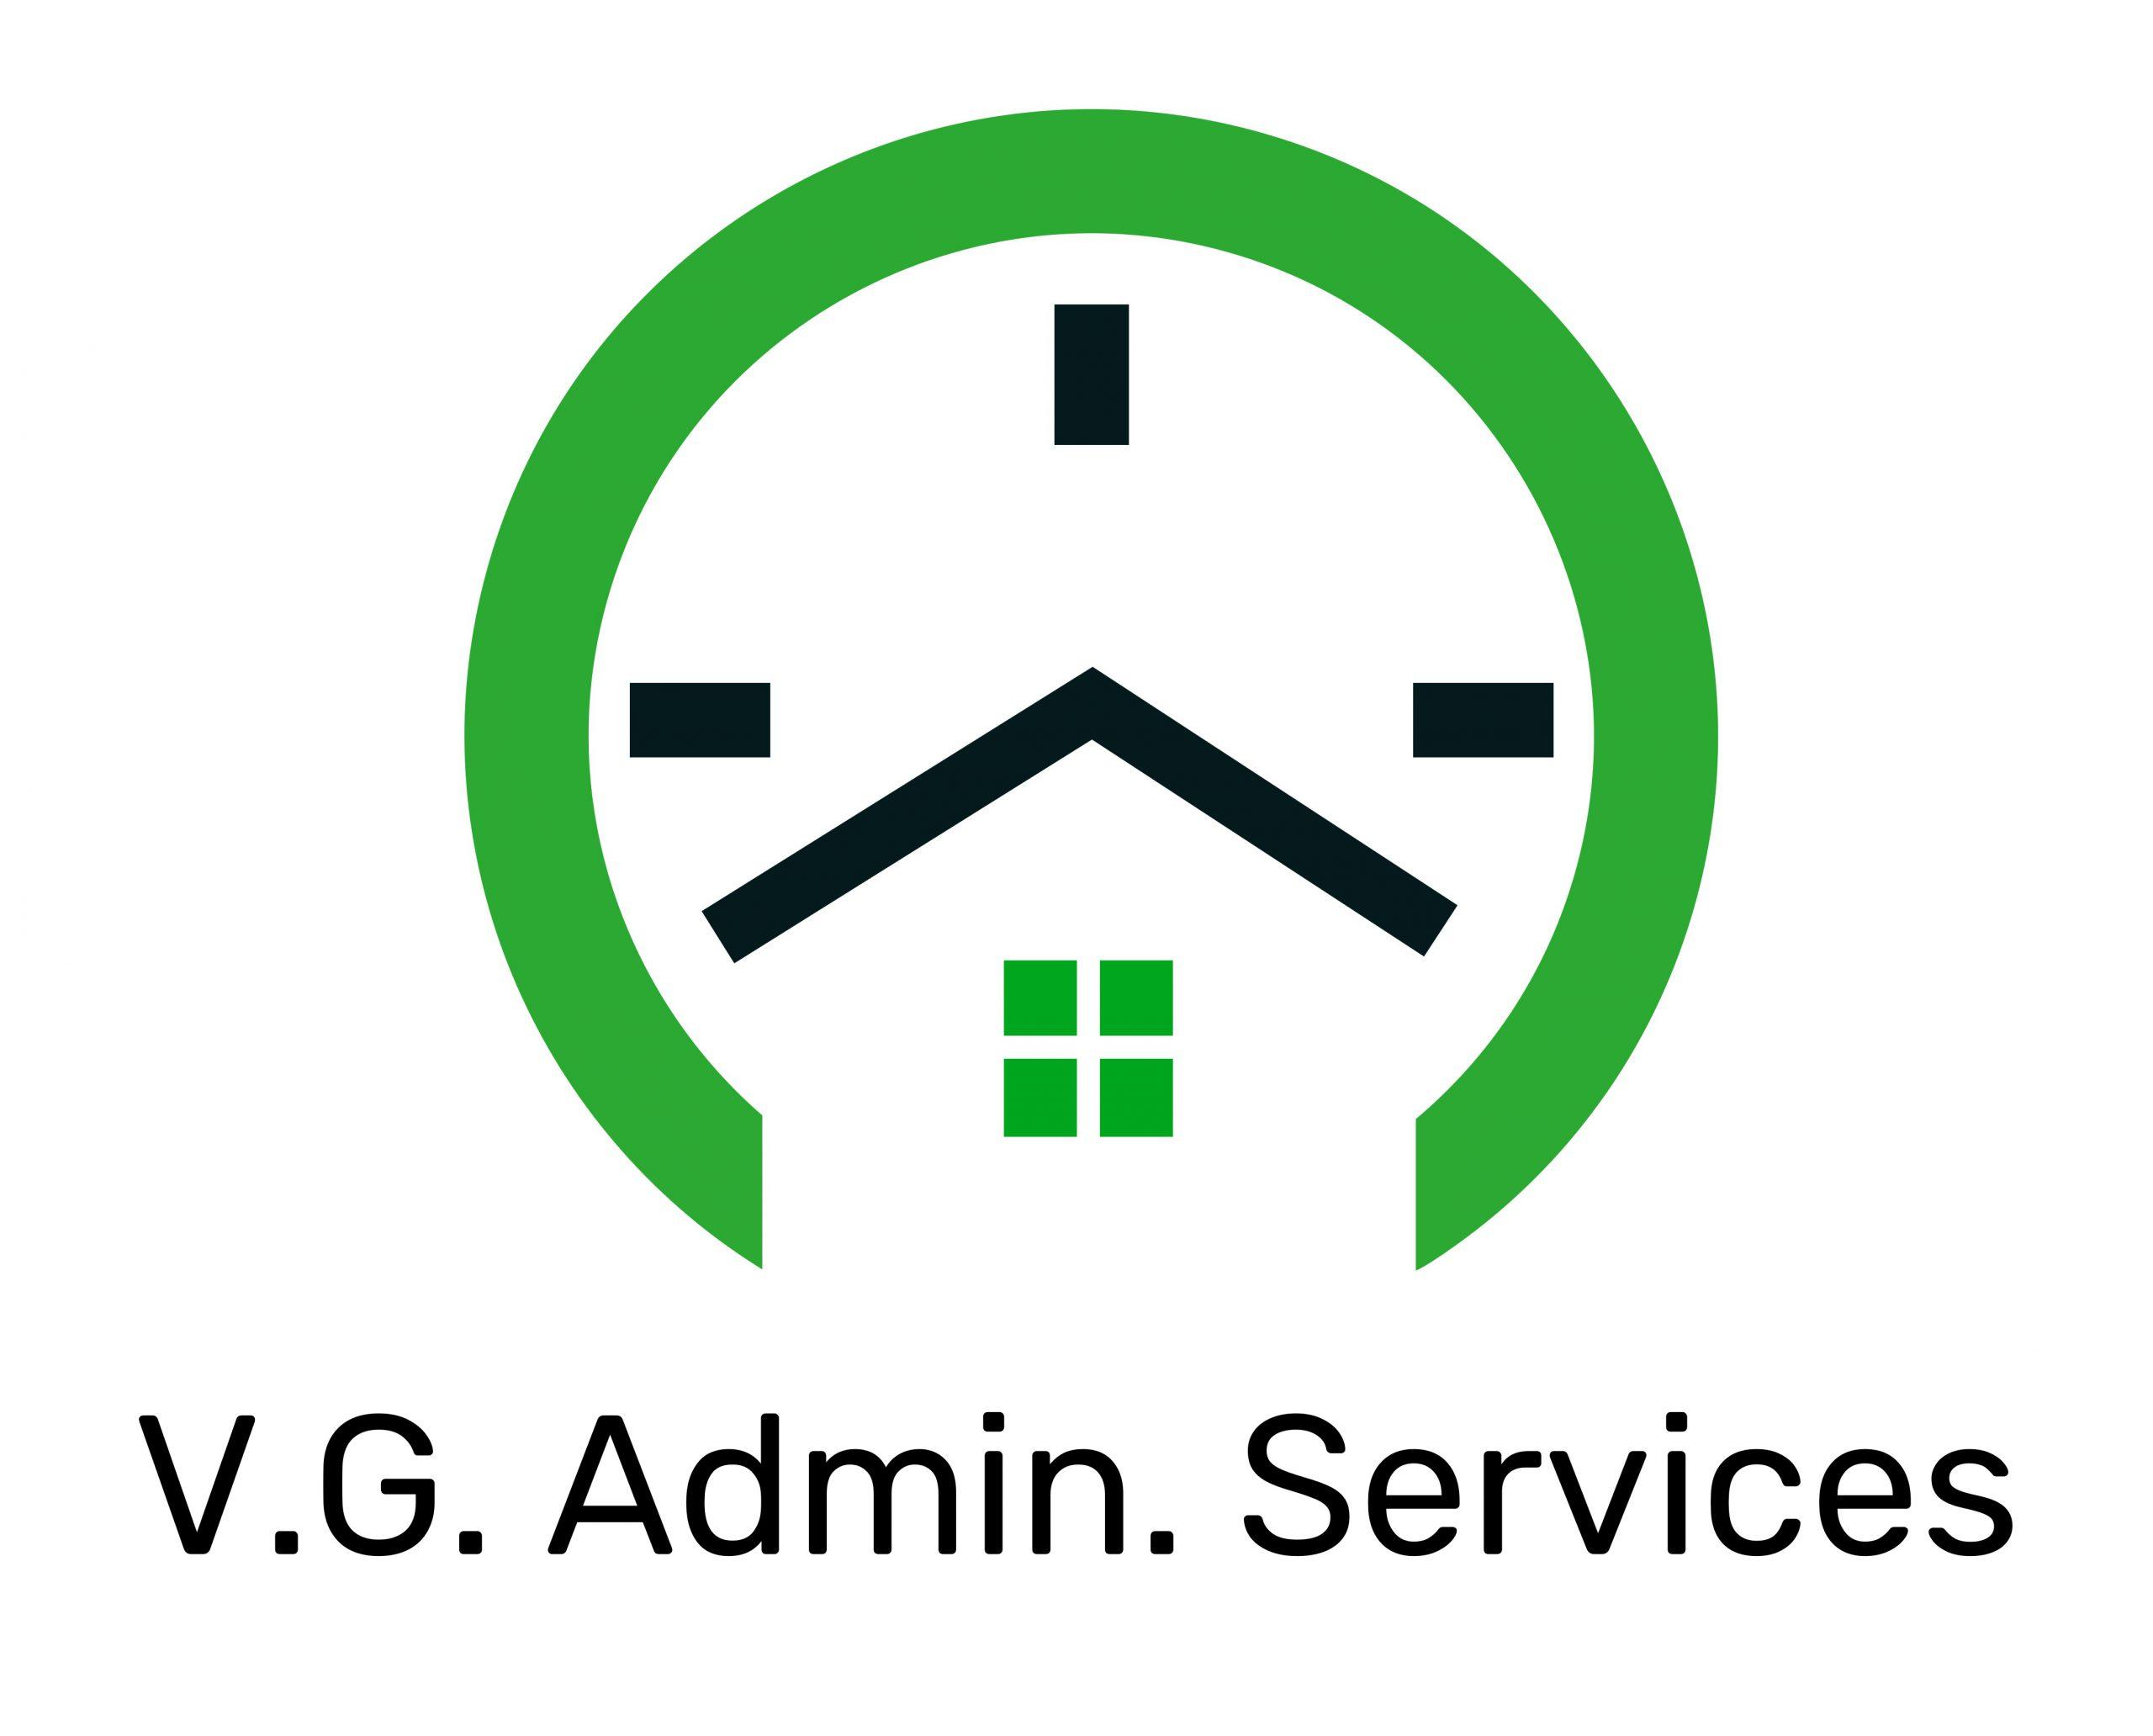 V G Admin Services